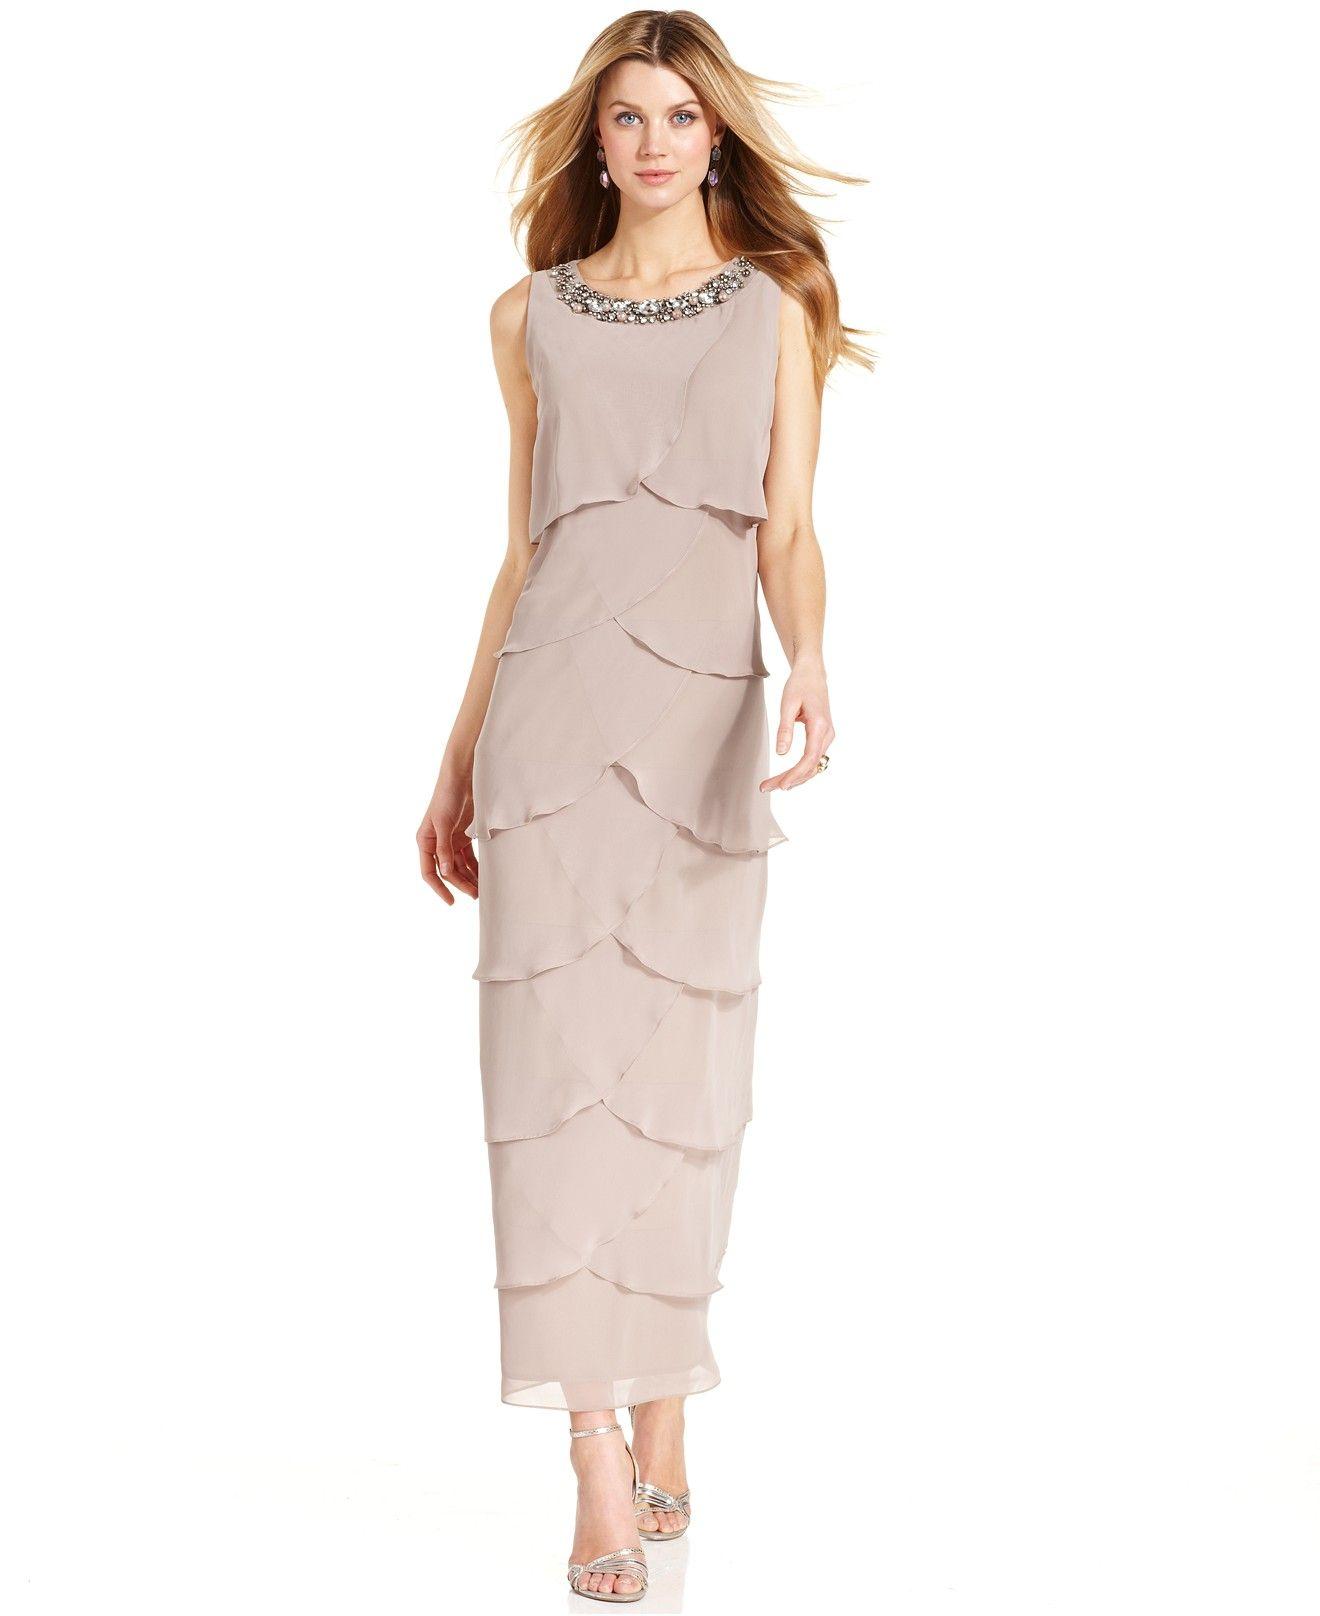 Beaded Tiered Dress